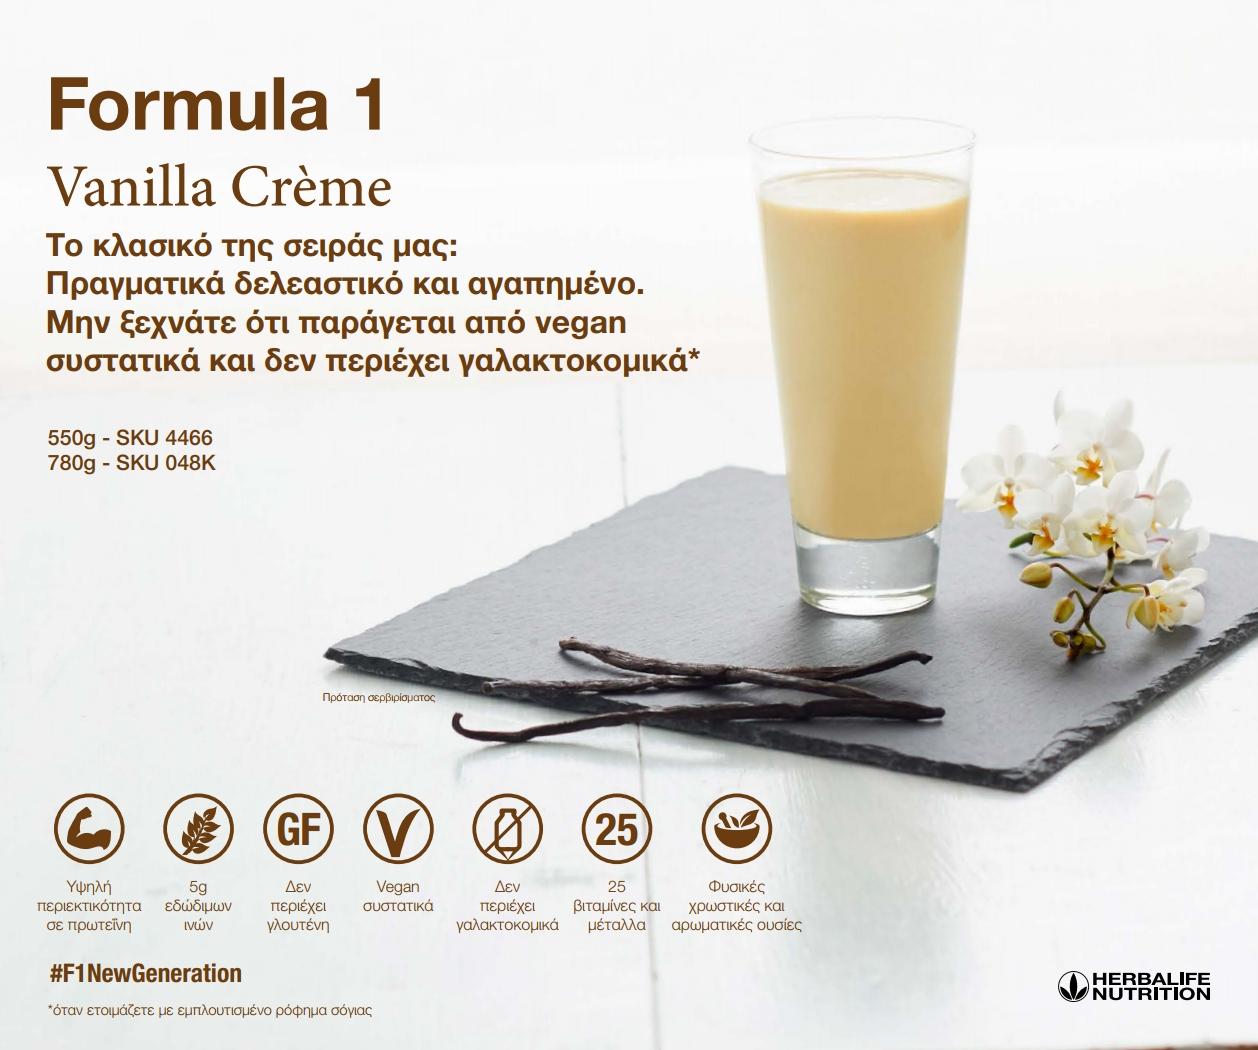 Herbalife Formula 1 Θρεπτικό Πρωτεϊνούχο Ρόφημα Βανίλια